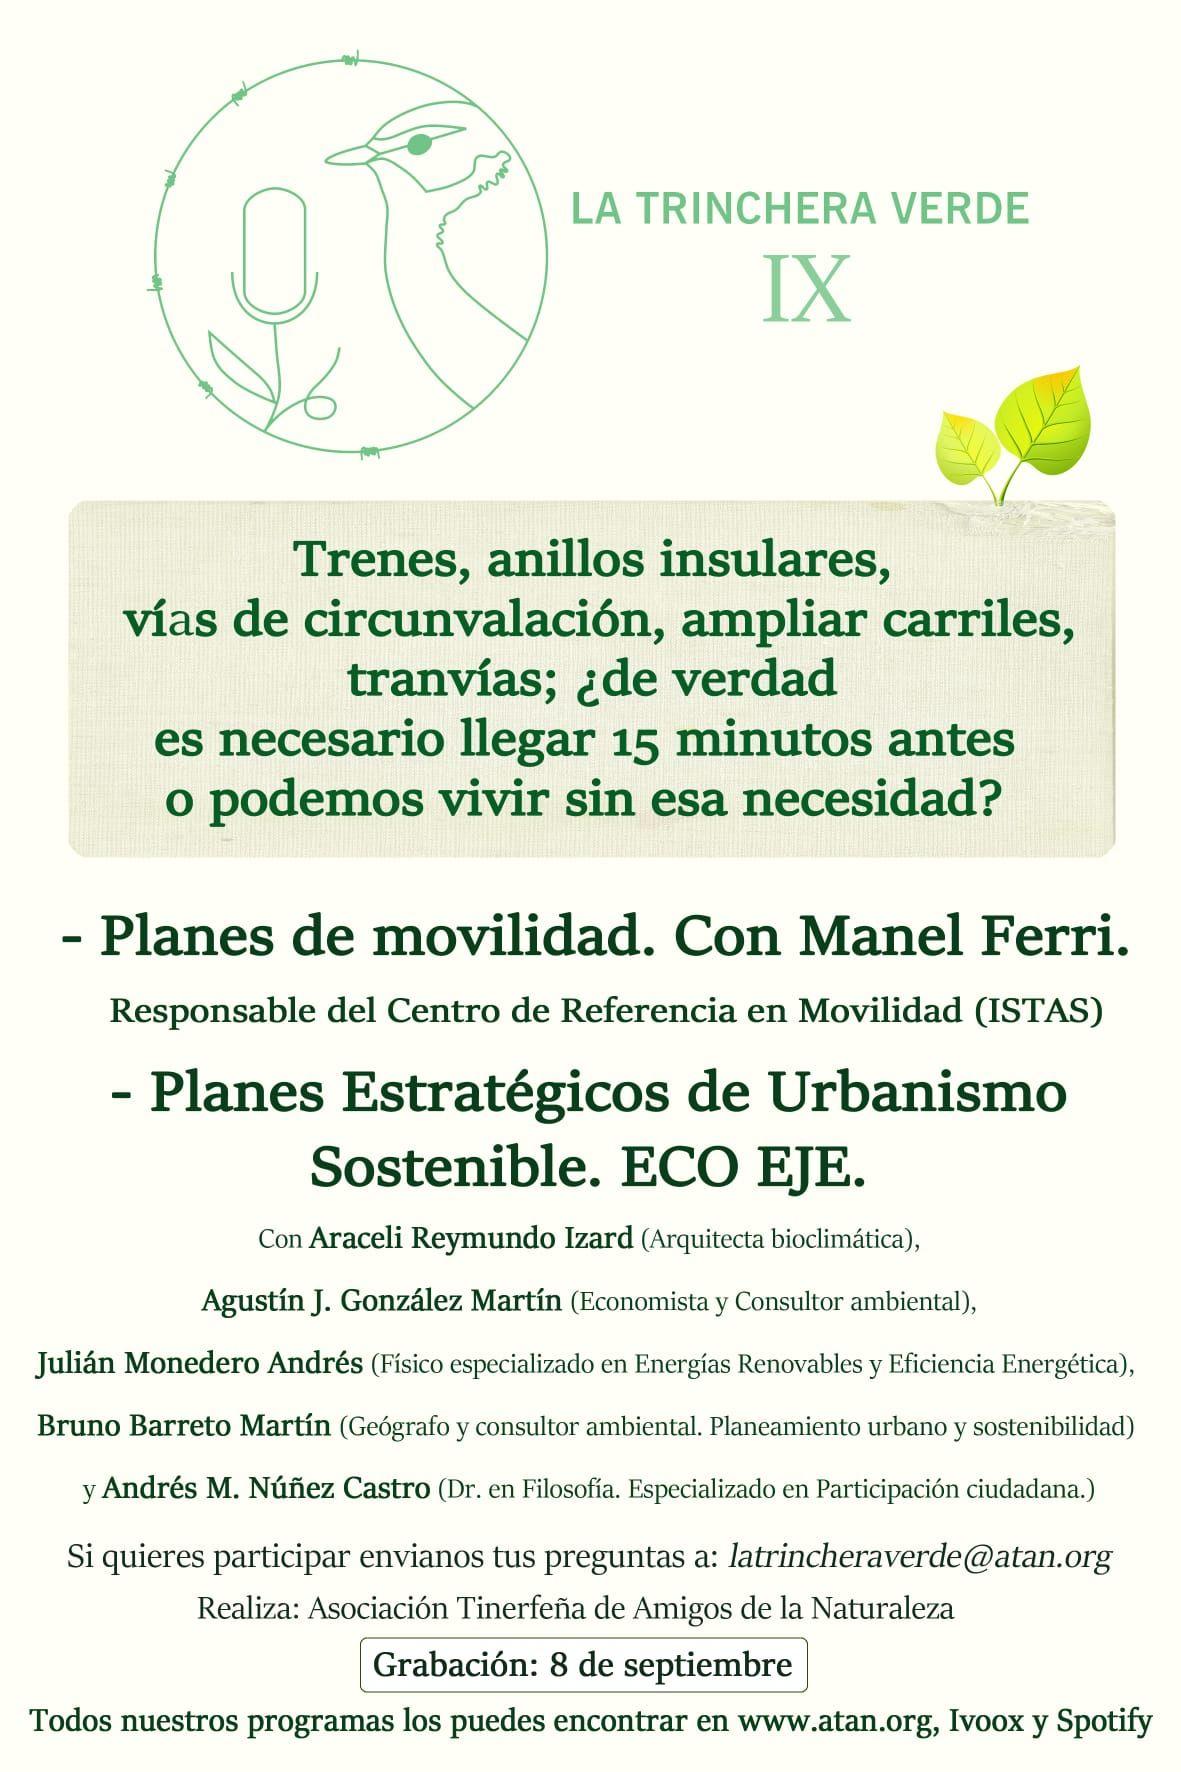 Posdcast Urbanismo Sostenible. Eco Eje - Planes de Movilidad con Manel Ferri